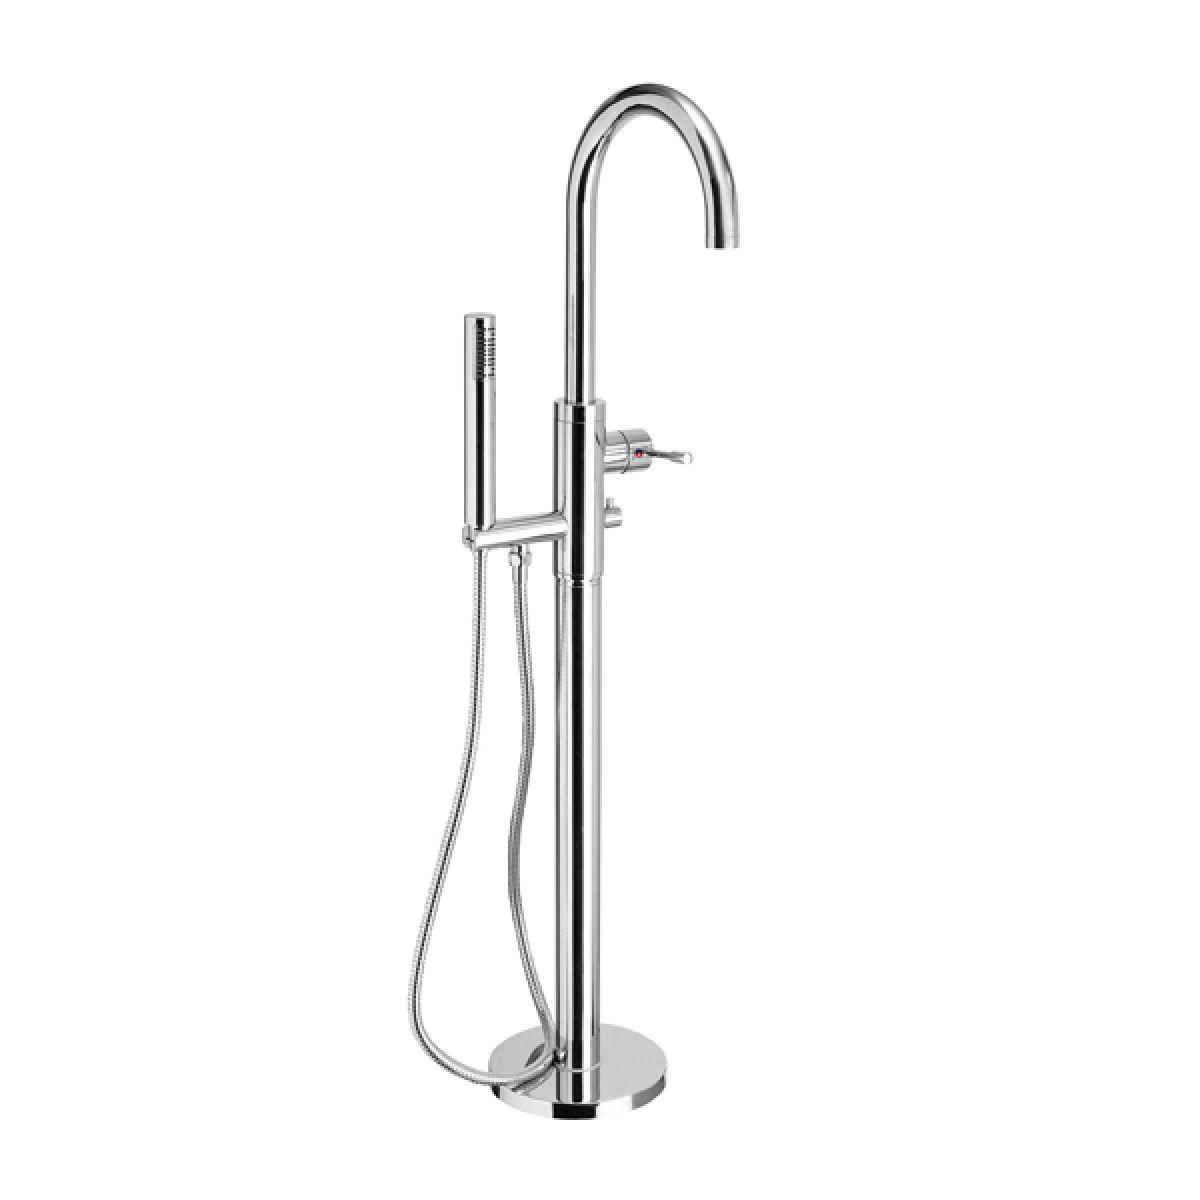 Eurostream Primo Floor Standing Bath Shower Mixer